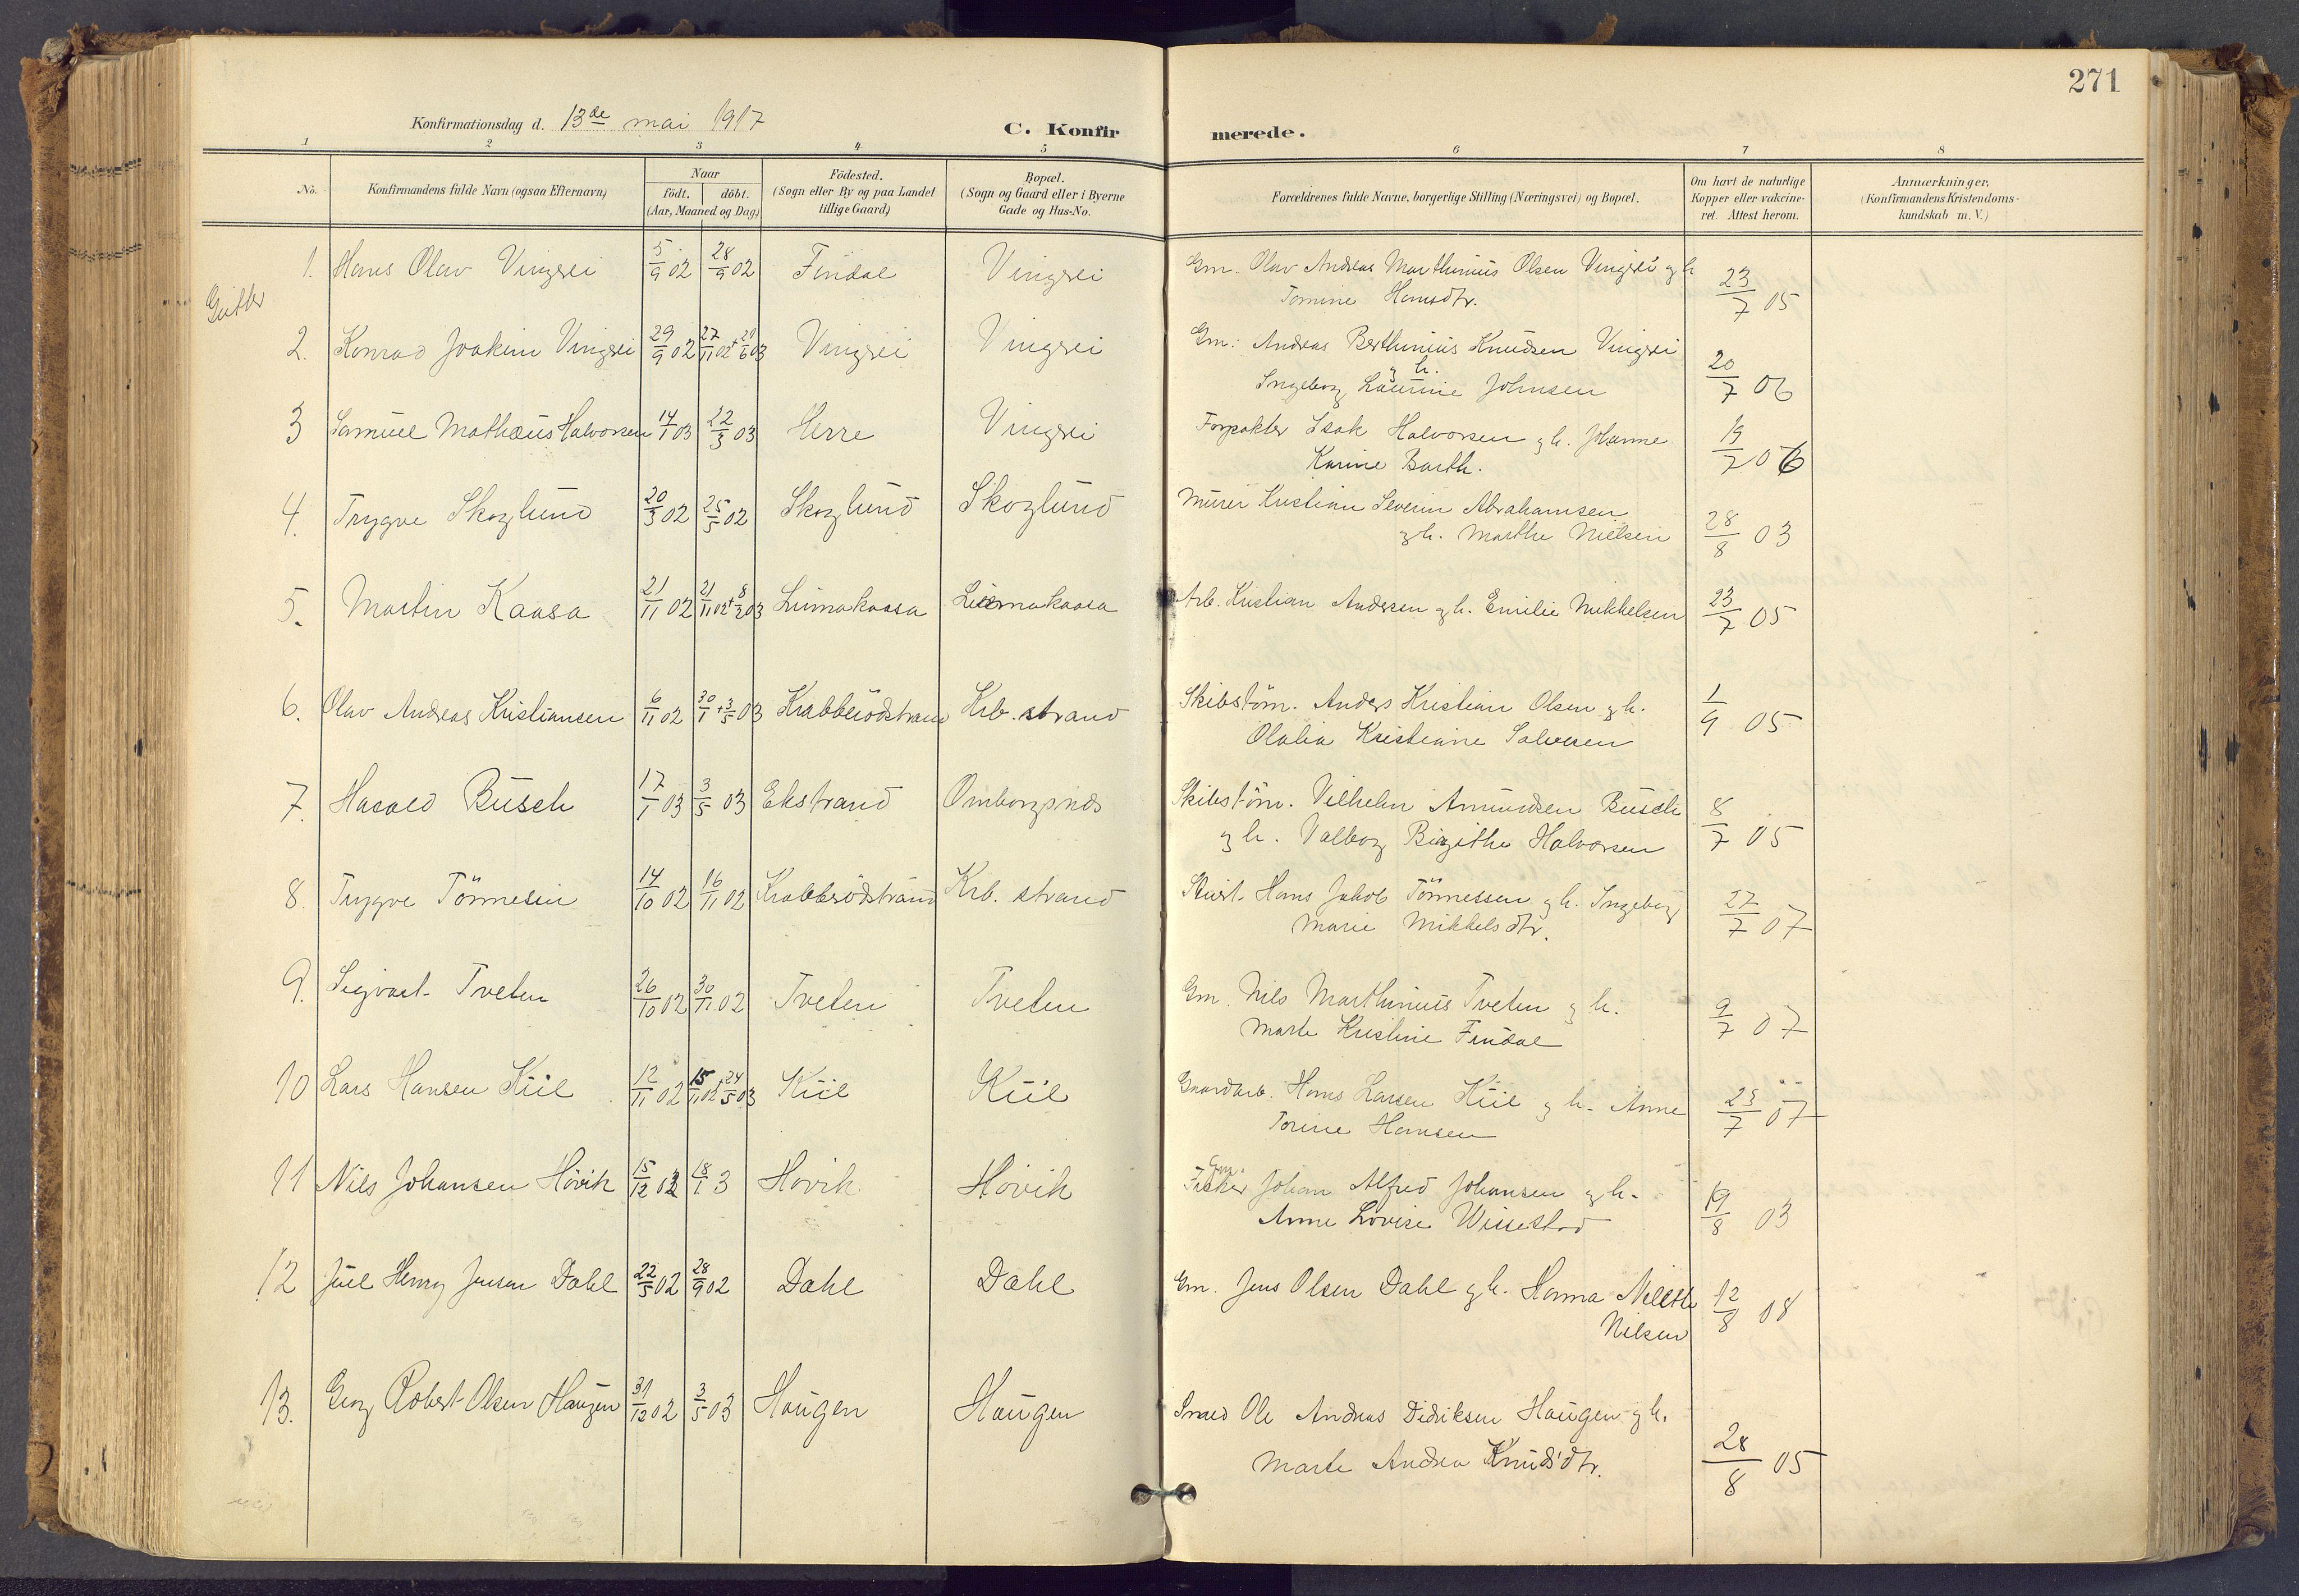 SAKO, Bamble kirkebøker, F/Fa/L0009: Ministerialbok nr. I 9, 1901-1917, s. 271